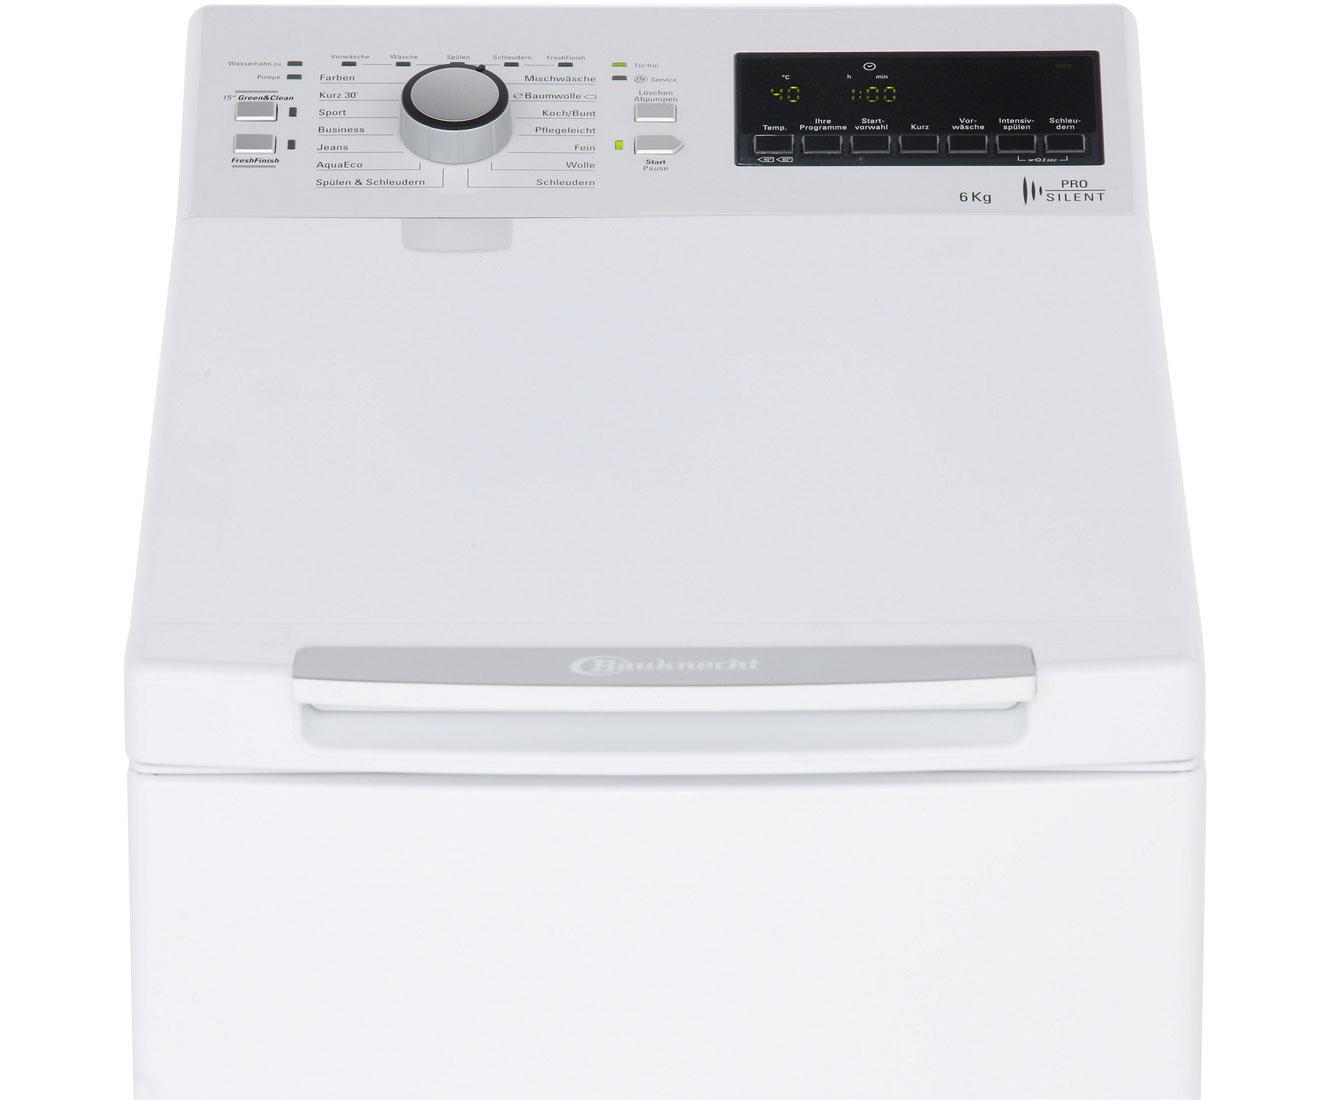 Bauknecht wat prime 652 ps waschmaschine toplader 6 kg 1200 u min